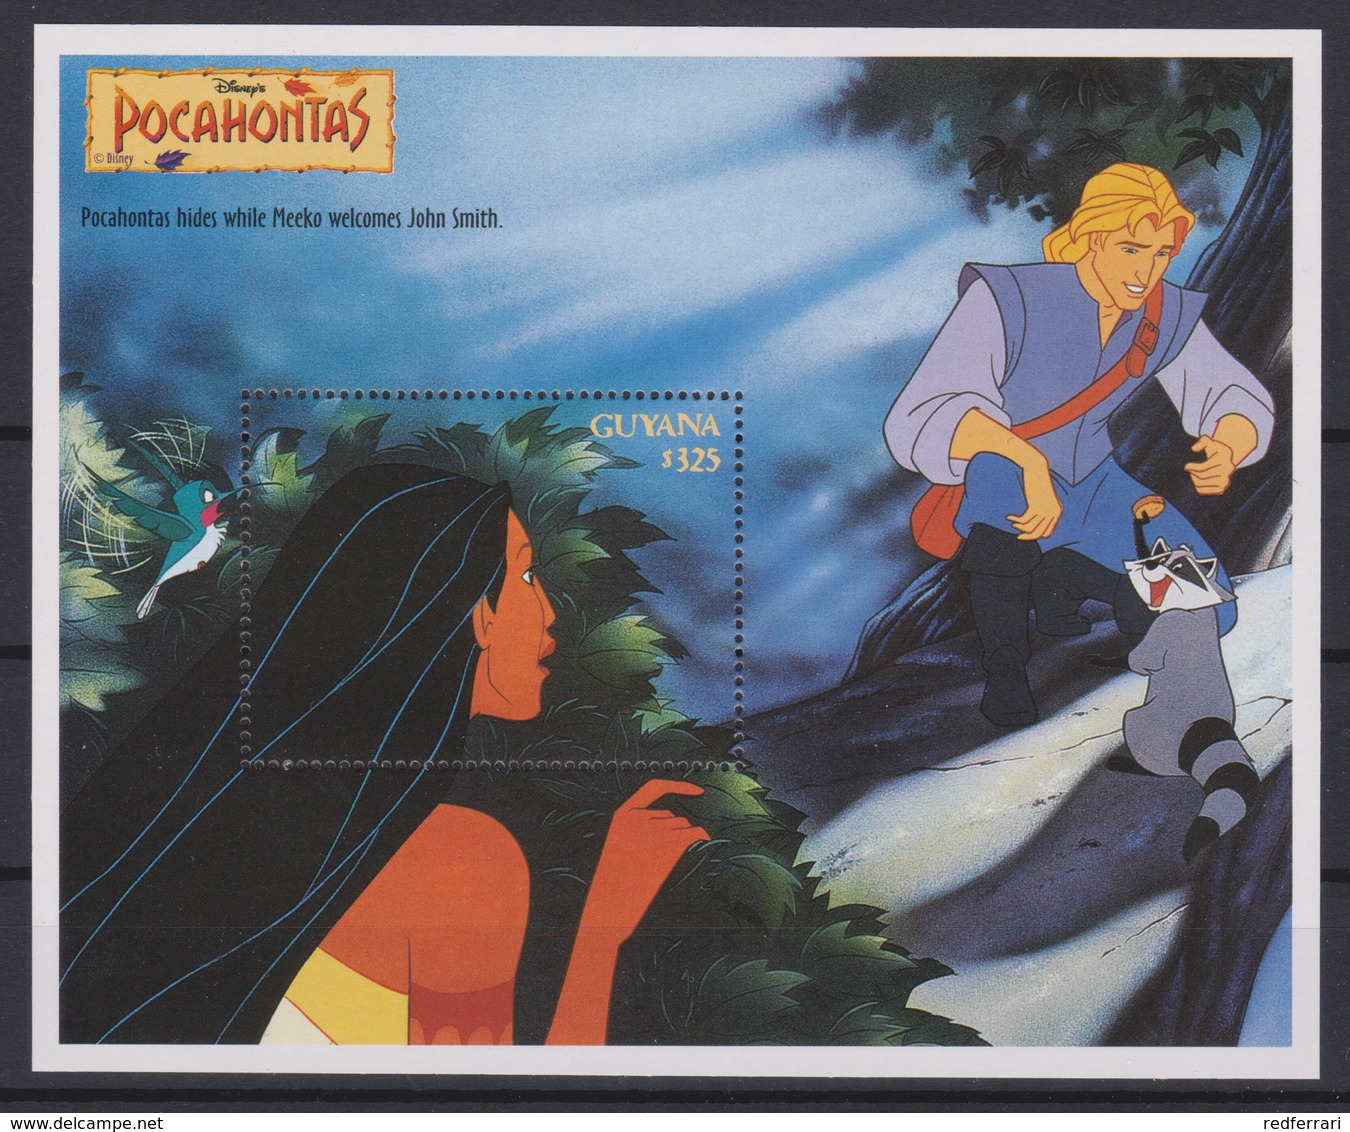 2324  WALT DISNEY - GUYANA ( POCAHONTAS) Presentation Of The Cartoon Characters - Meeko Welcomes John Smith . - Disney